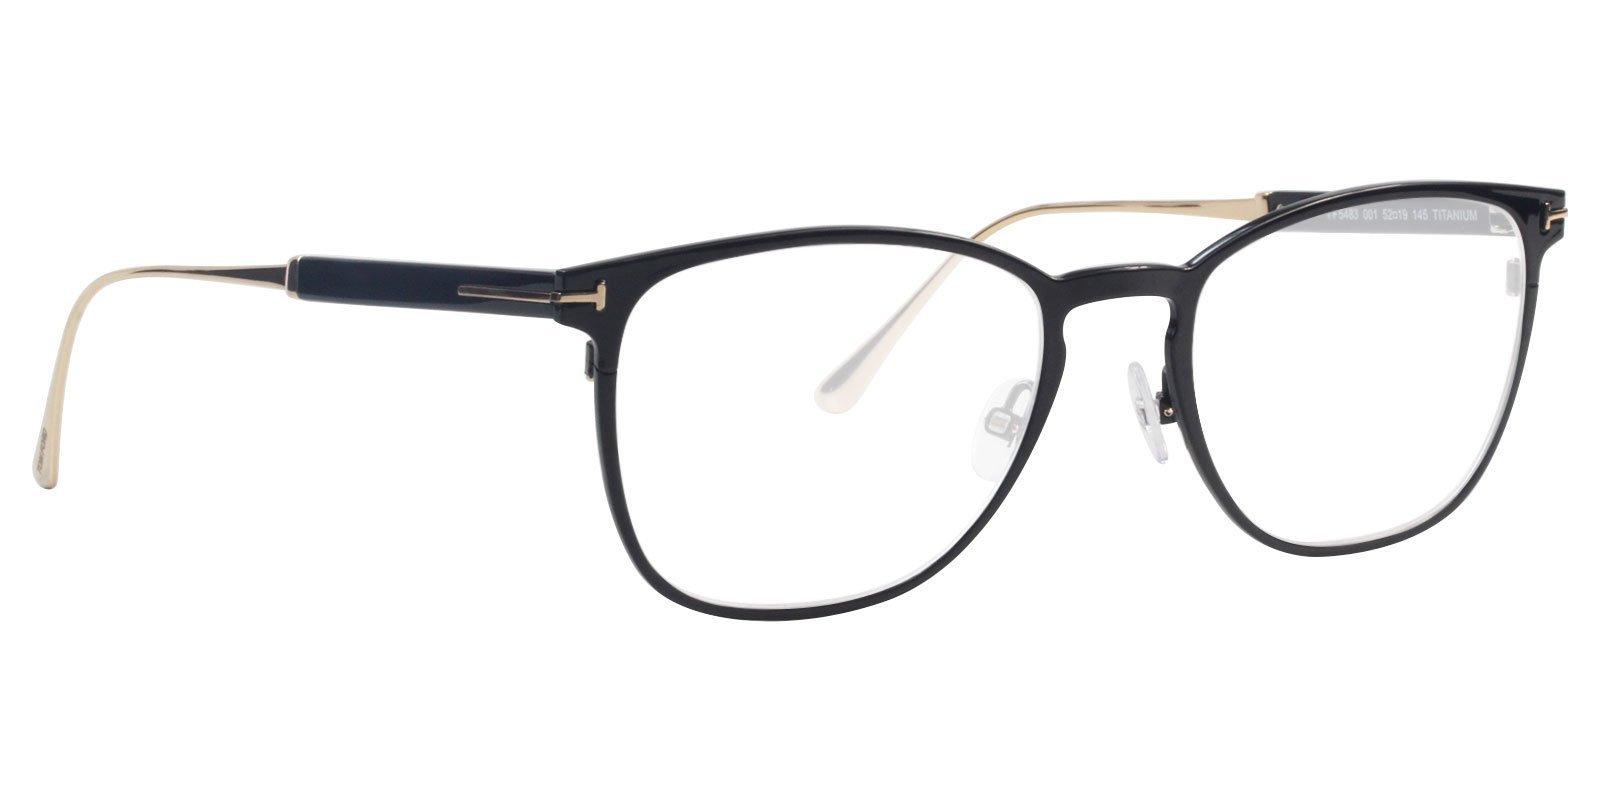 1dfb0ac674 Tom Ford - FT5483 Black eyeglasses